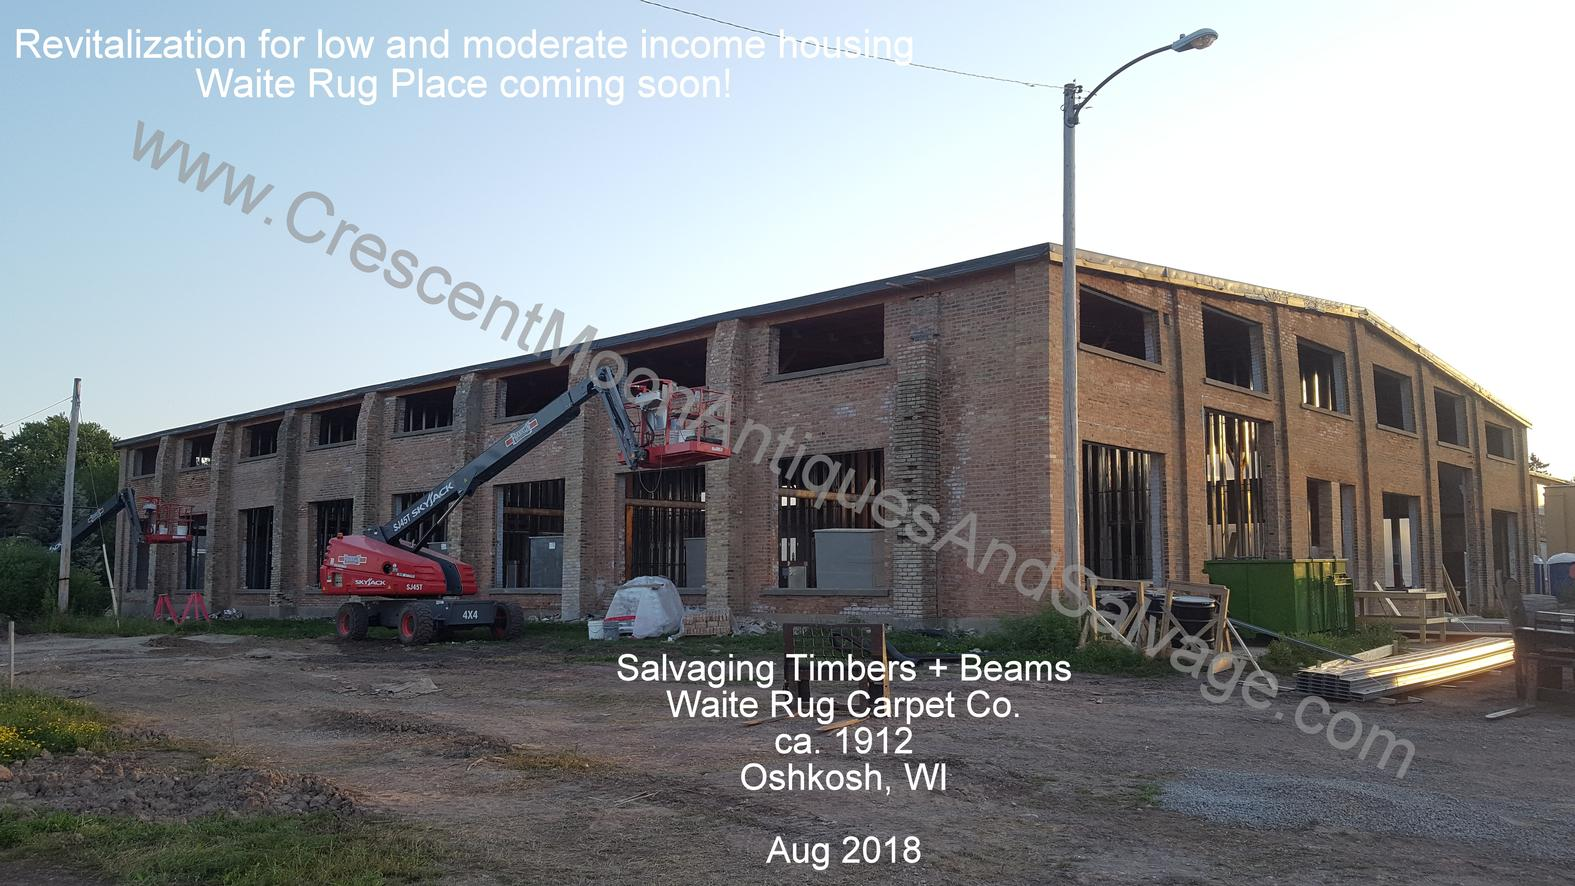 Salvage Timbers and Beams